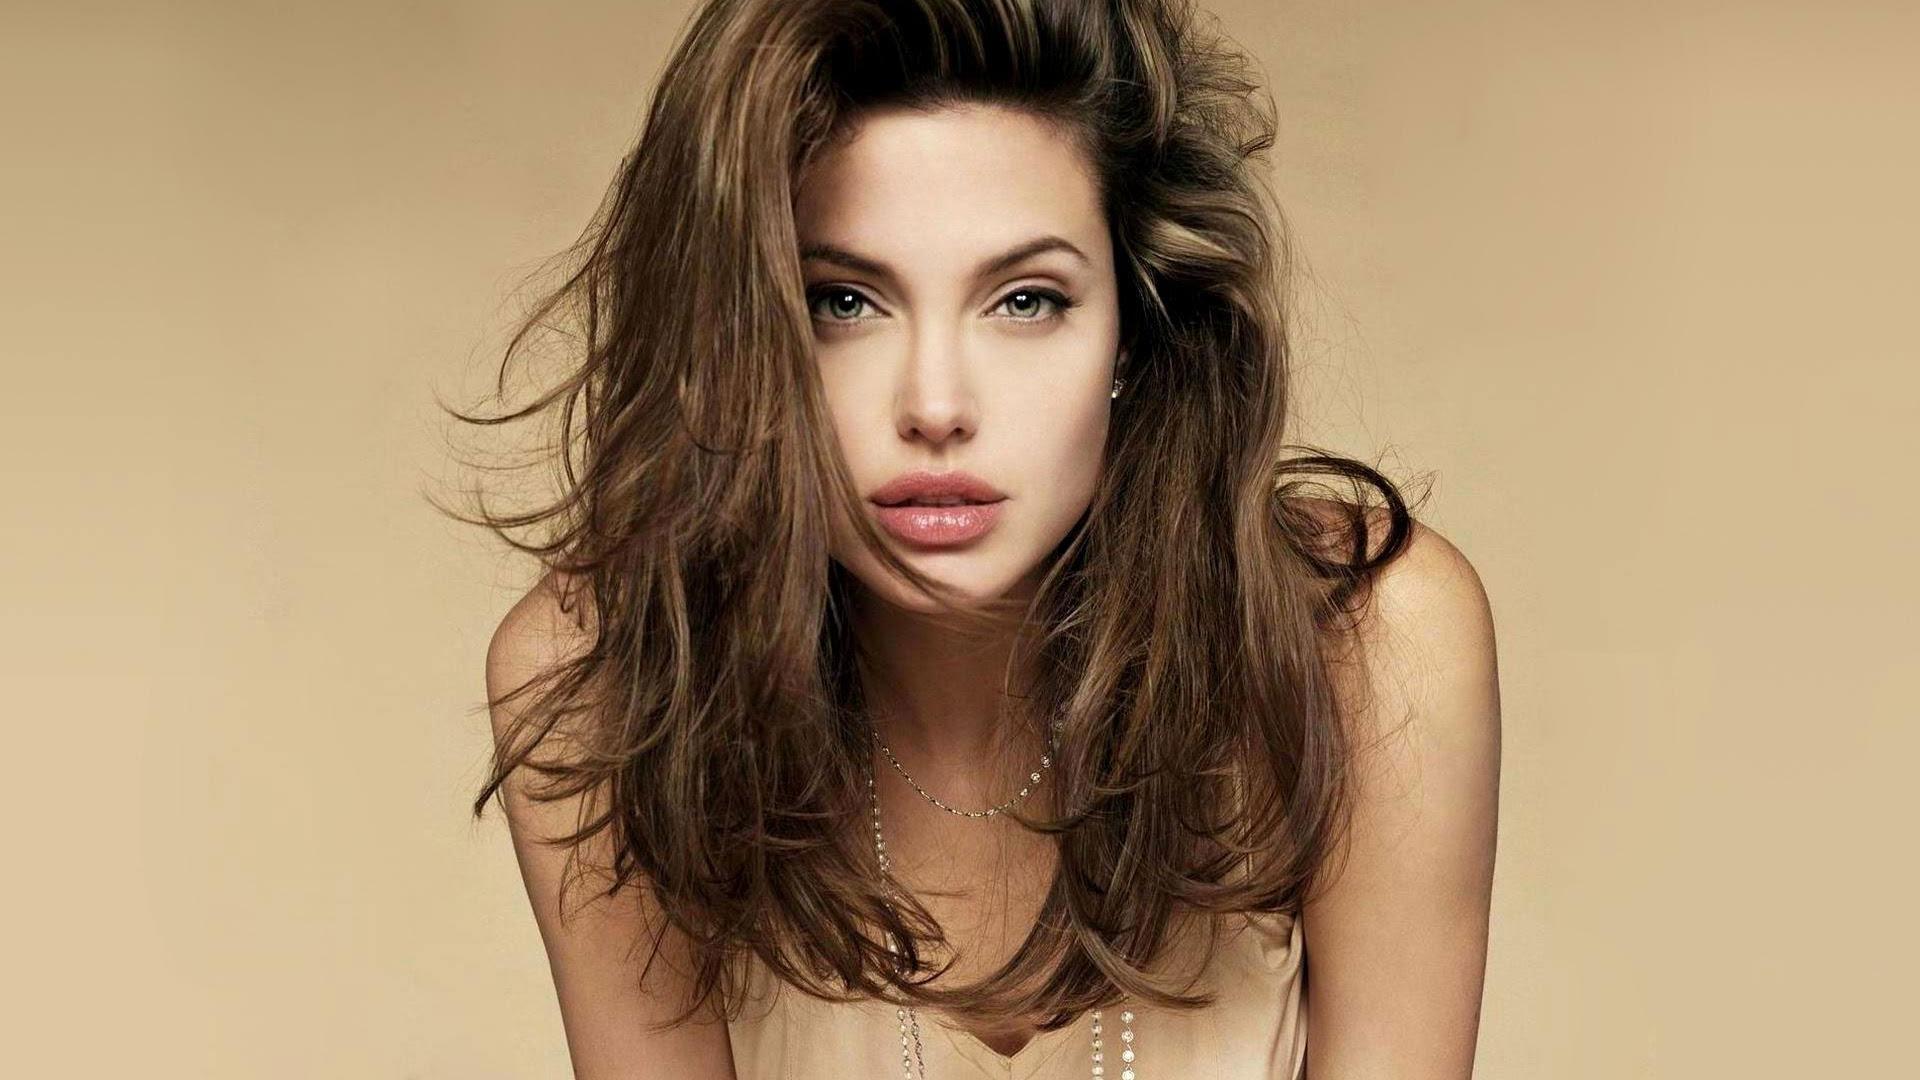 Angelina Jolie Green Eye [1280x1024]